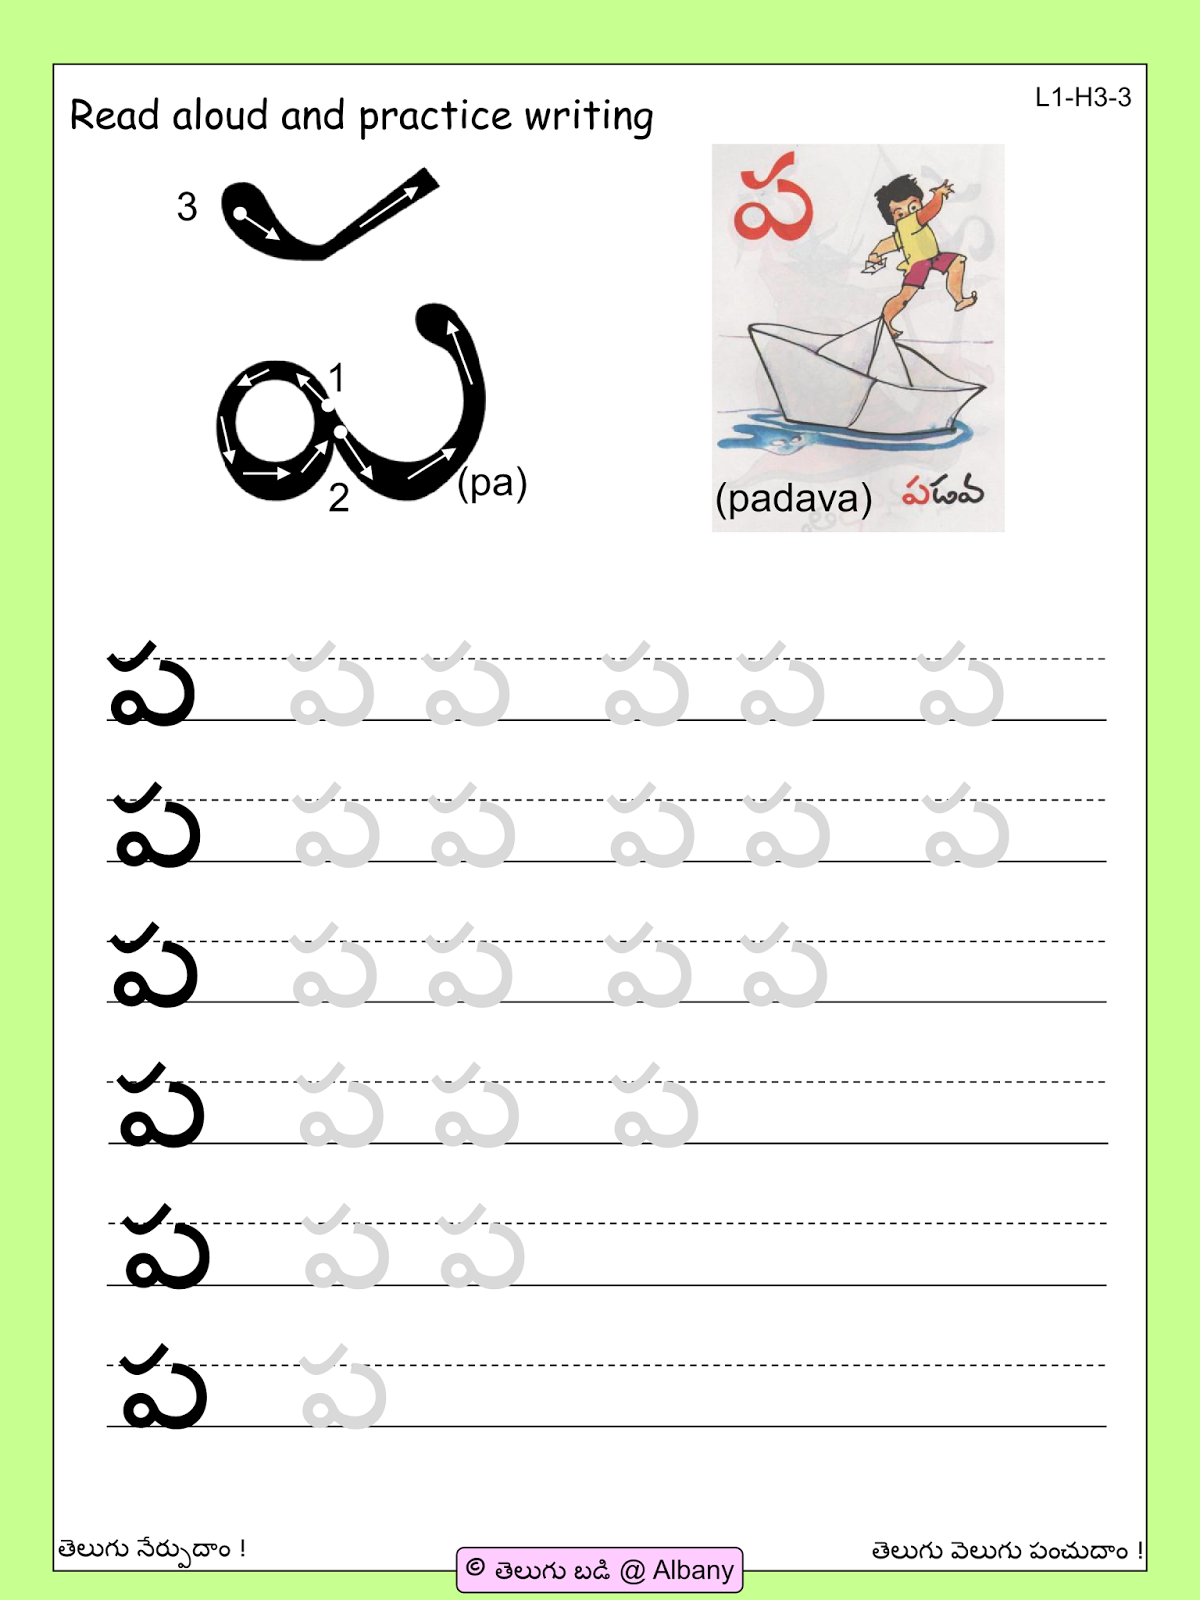 Telugu Picture Reading Video Lesson Panasa